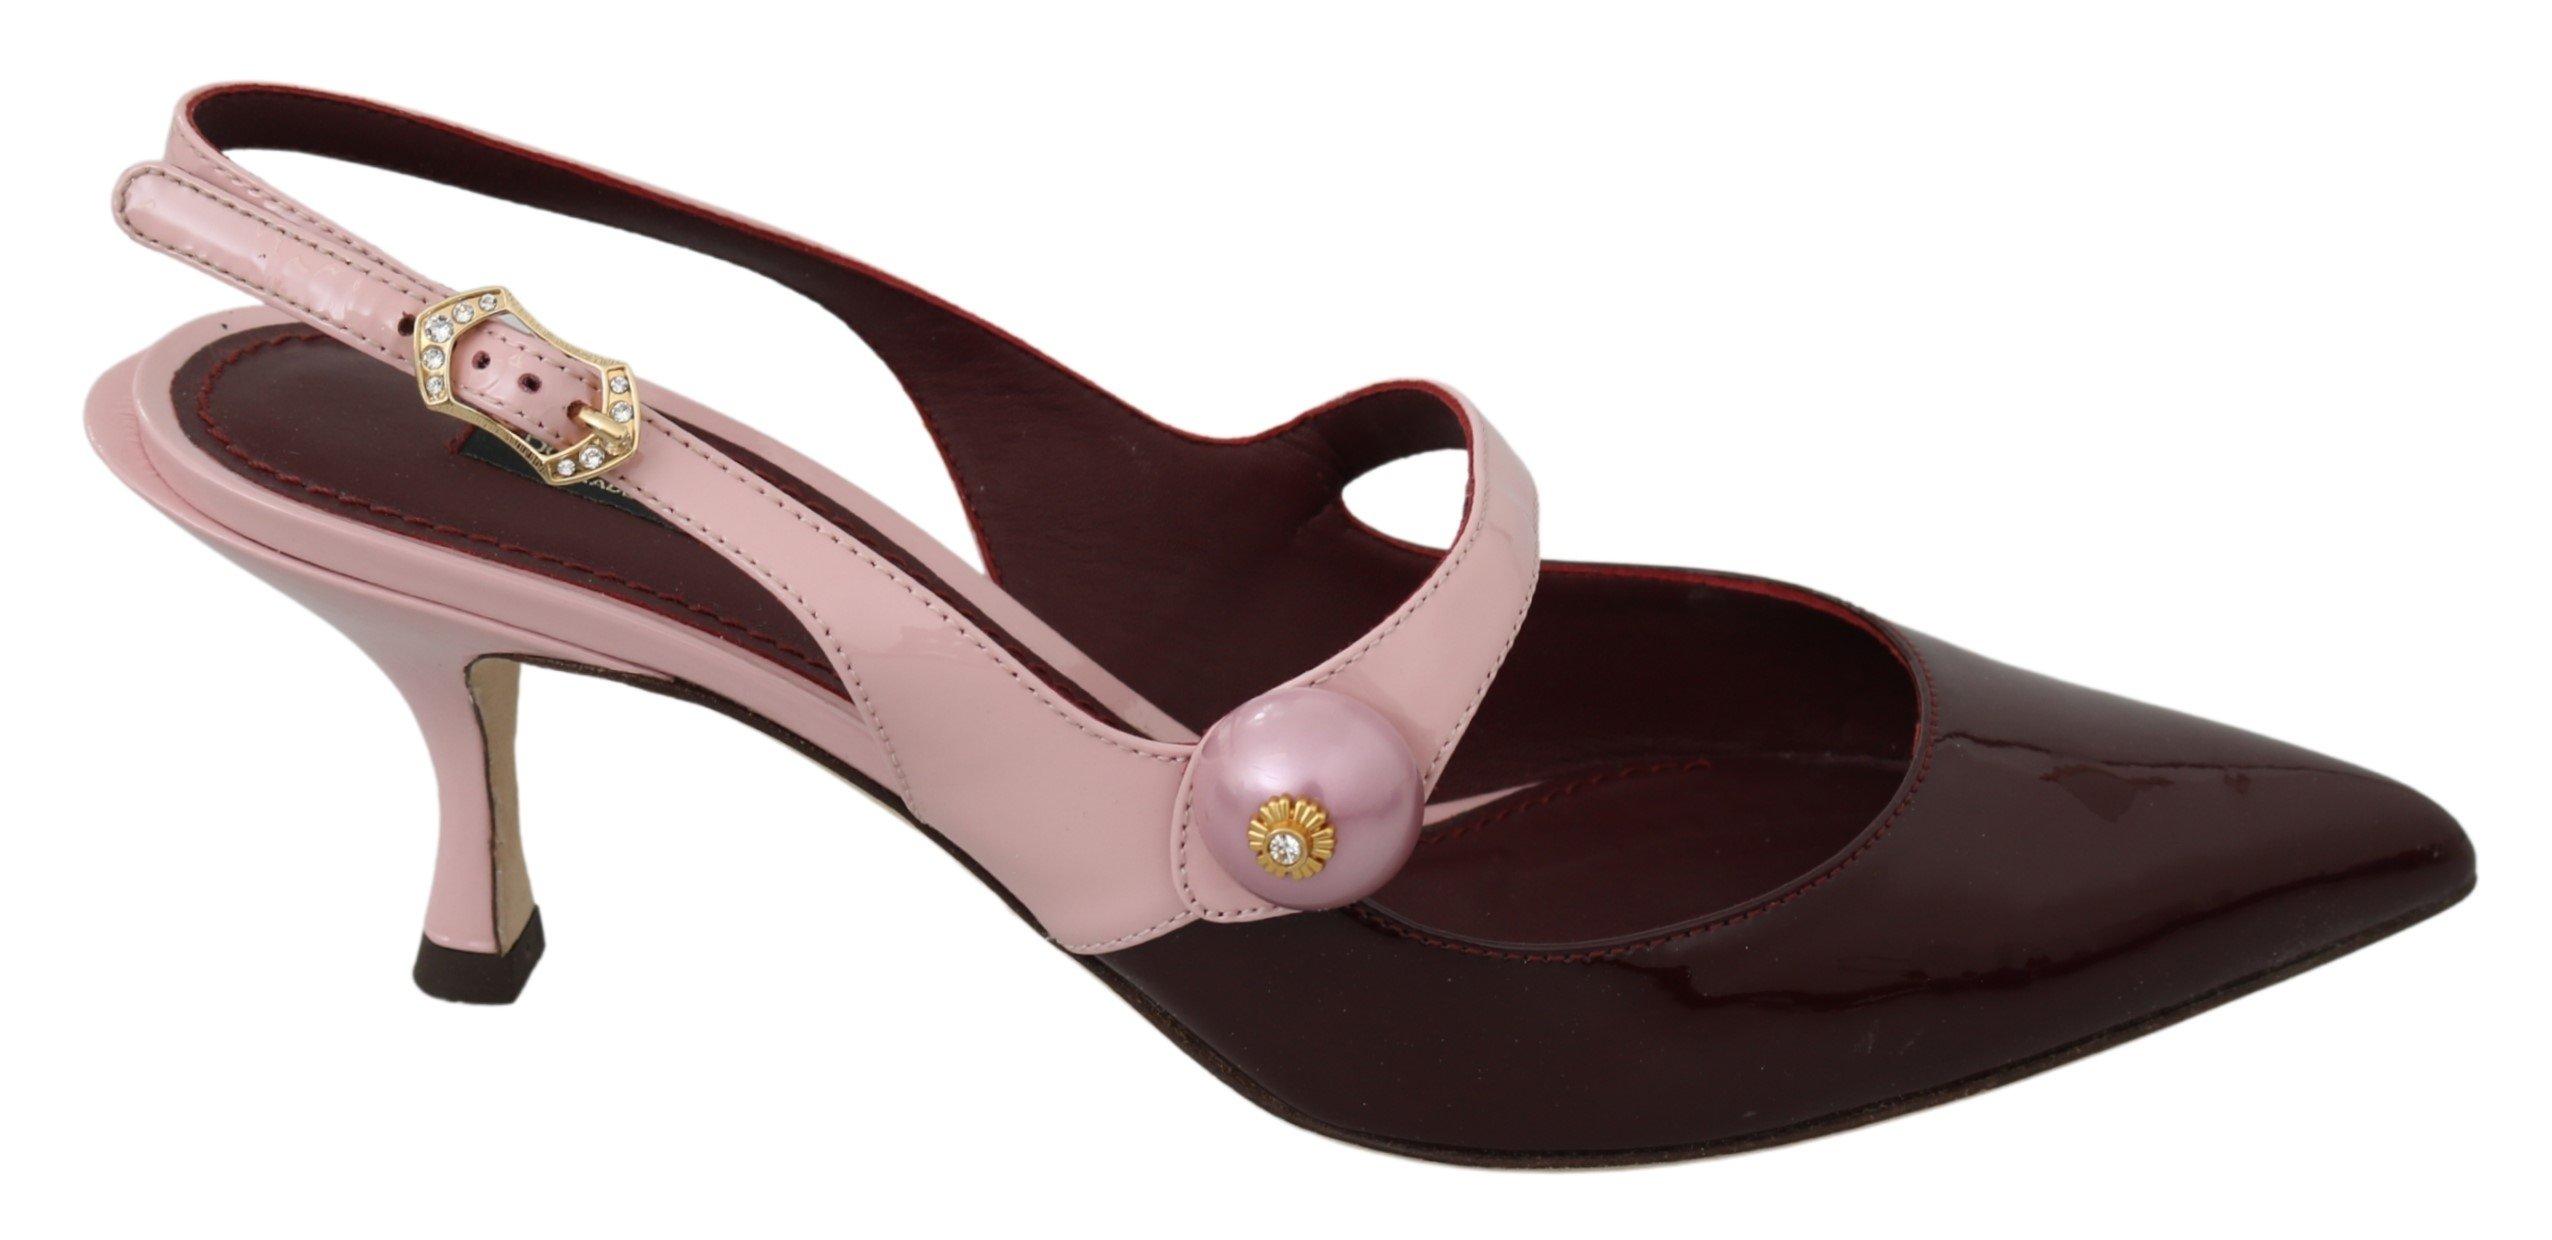 Dolce & Gabbana Women's Slingback Leather Heels Pink LA7135 - EU39.5/US6.5